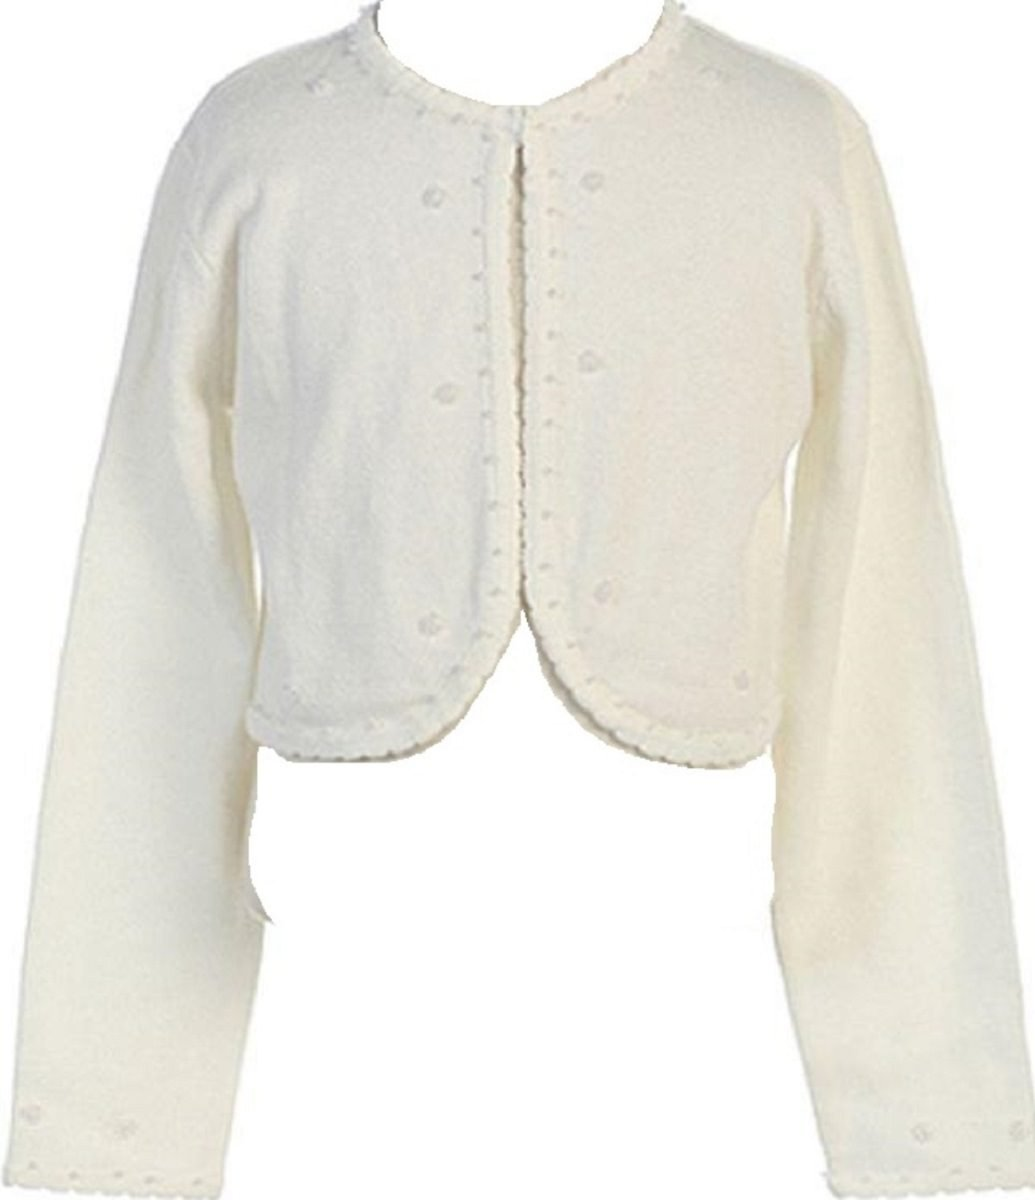 Little Girls Beaded Knit Cotton Bolero Shrug Sweater Ivory Size L (8-10)